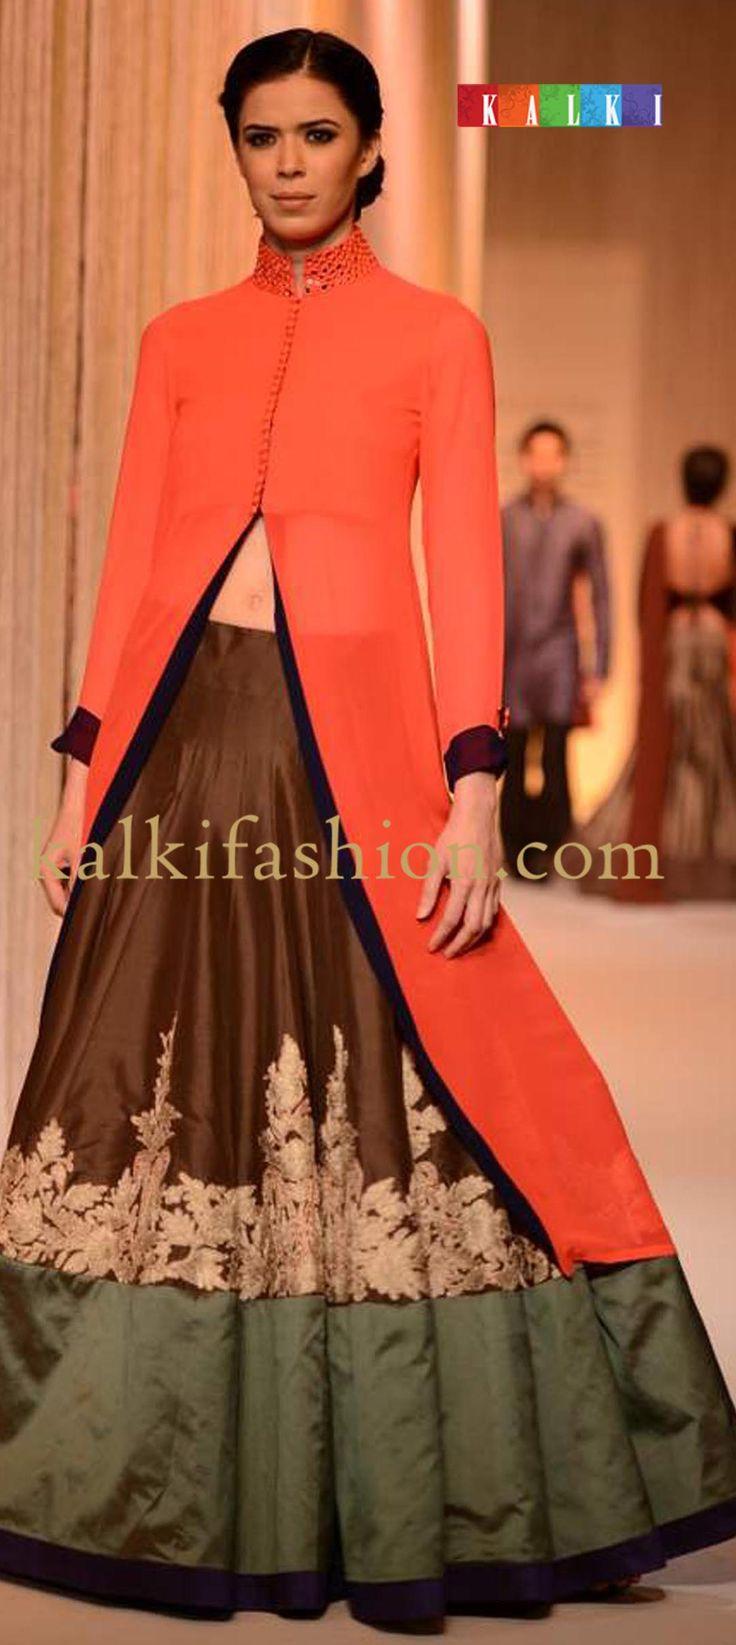 http://www.kalkifashion.com/designers/manish-malhotra.html      manish-malhotas-collecton-named-reflection-at-the-lakme-fashion-week-winter-festival-2013